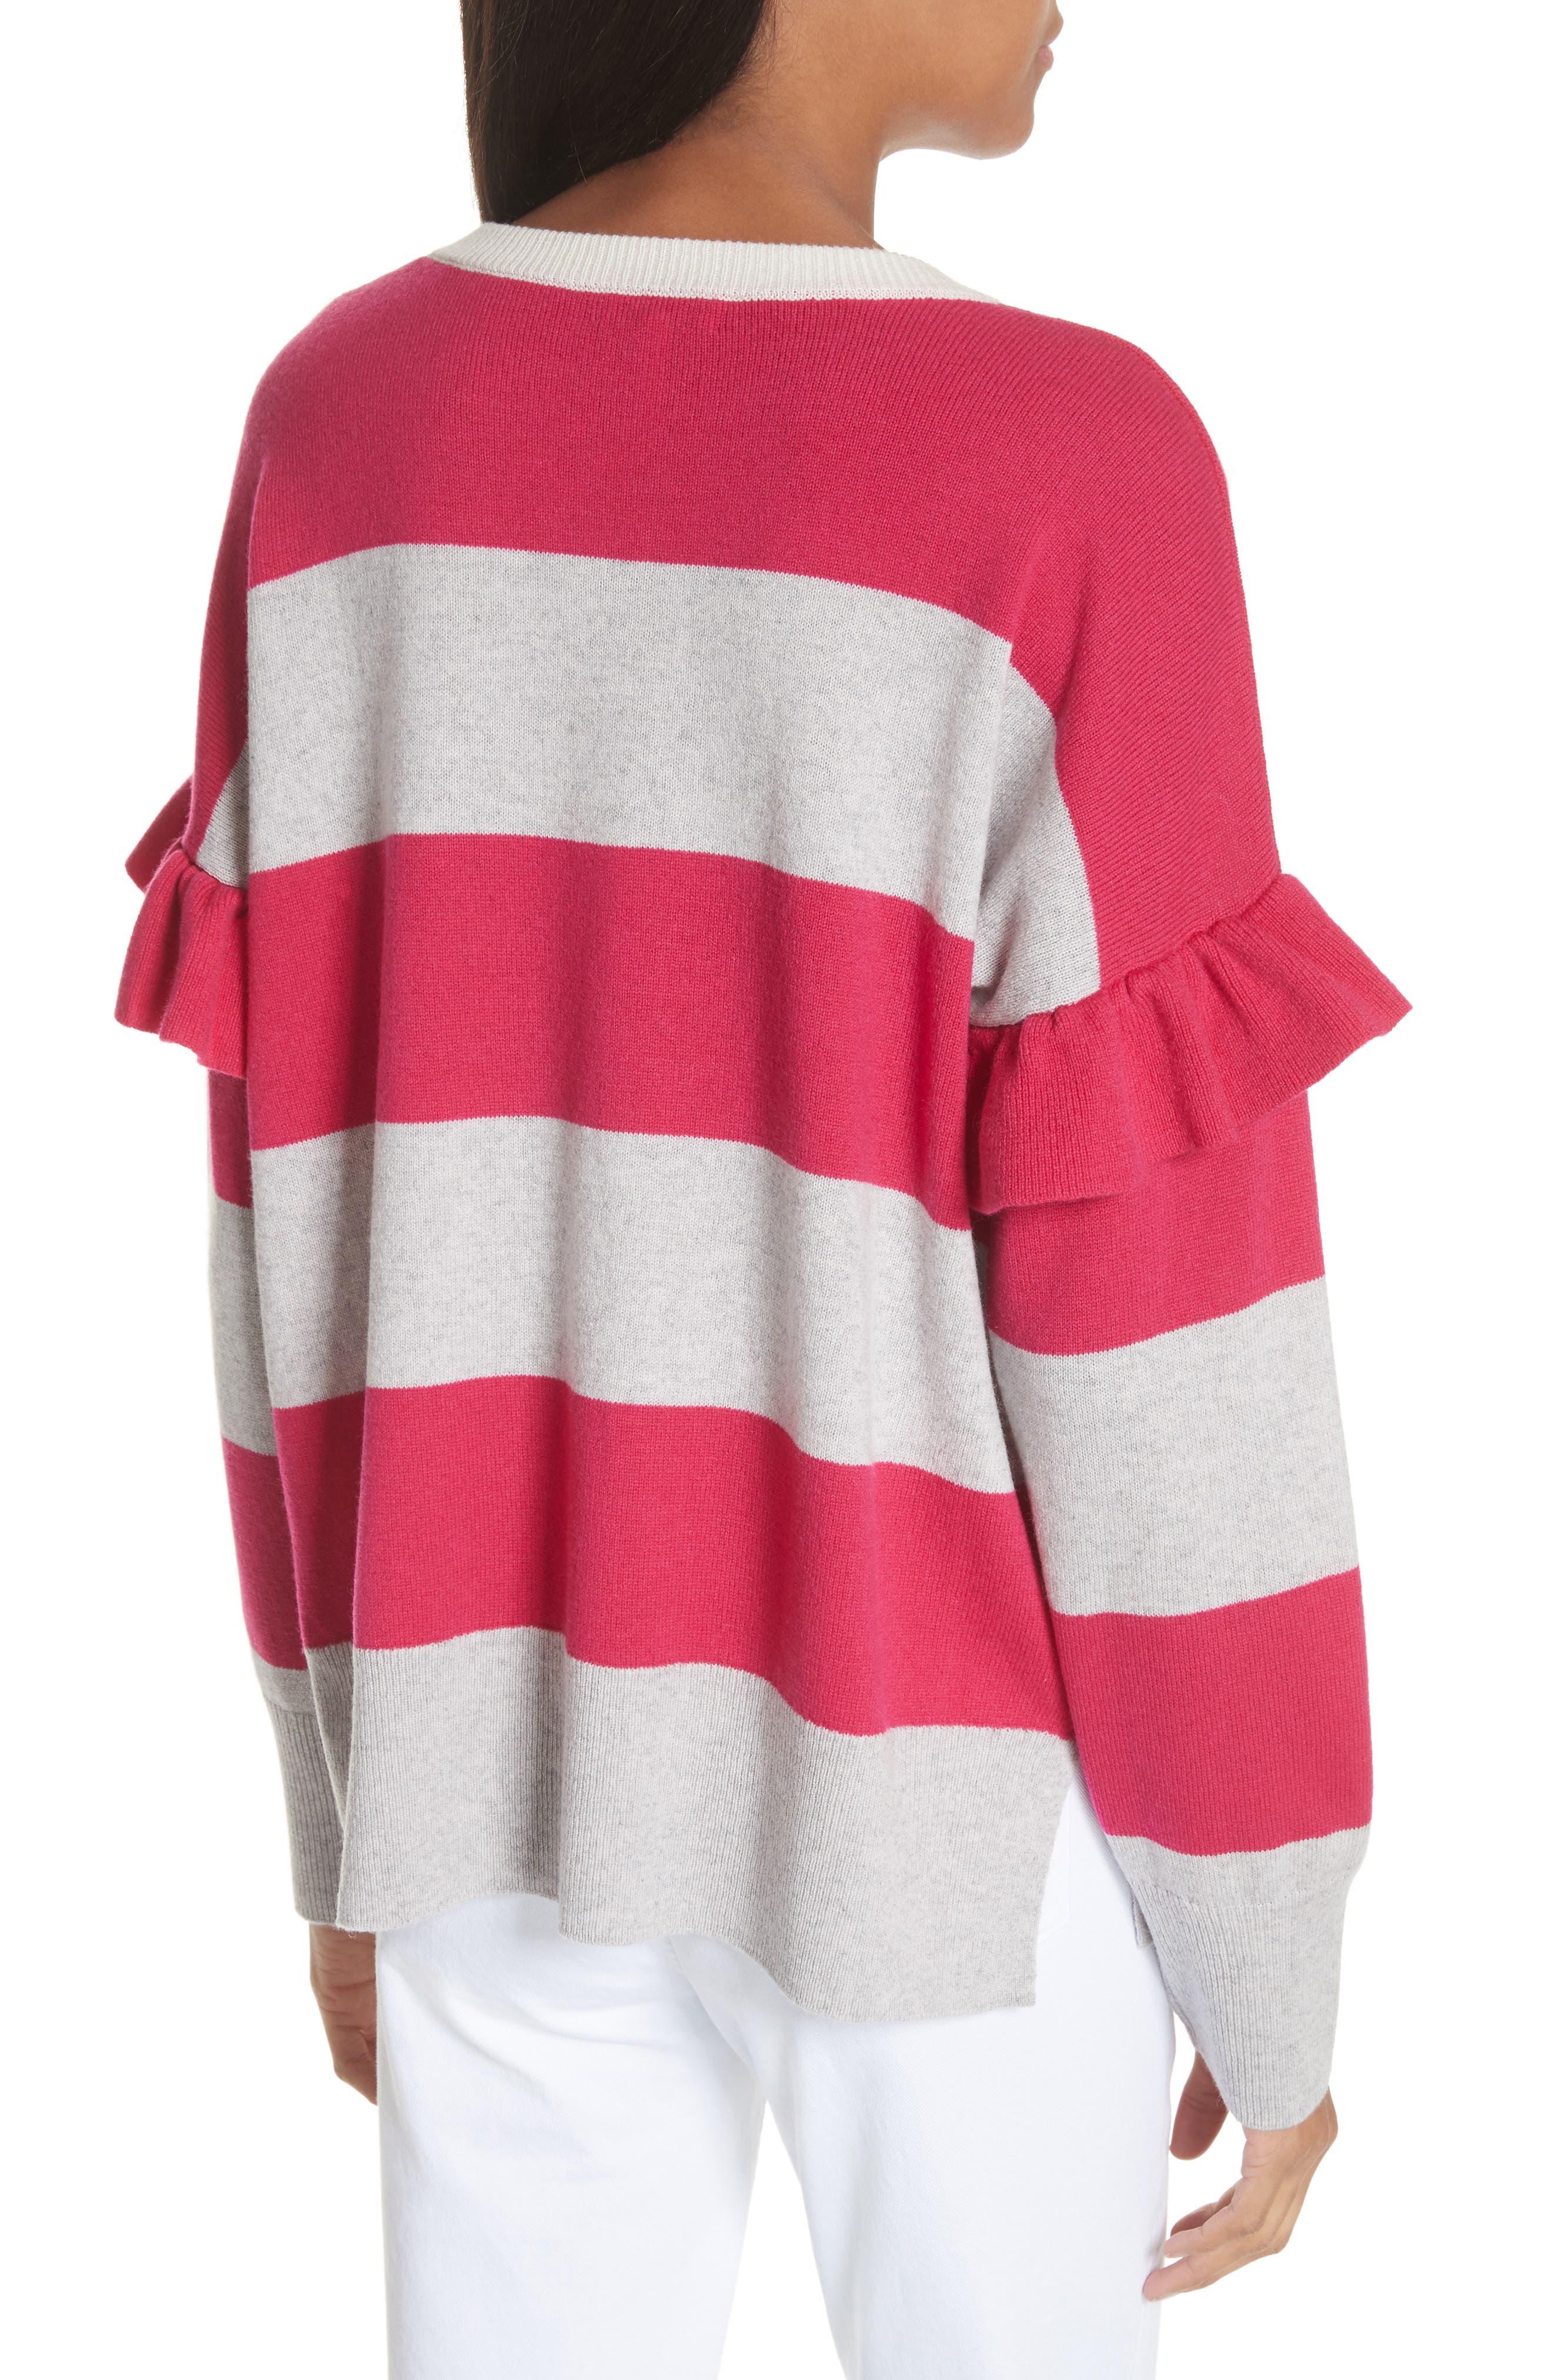 Inghin Stripe Wool & Cashmere Sweater,                             Alternate thumbnail 2, color,                             Hacienda/ Heather Grey